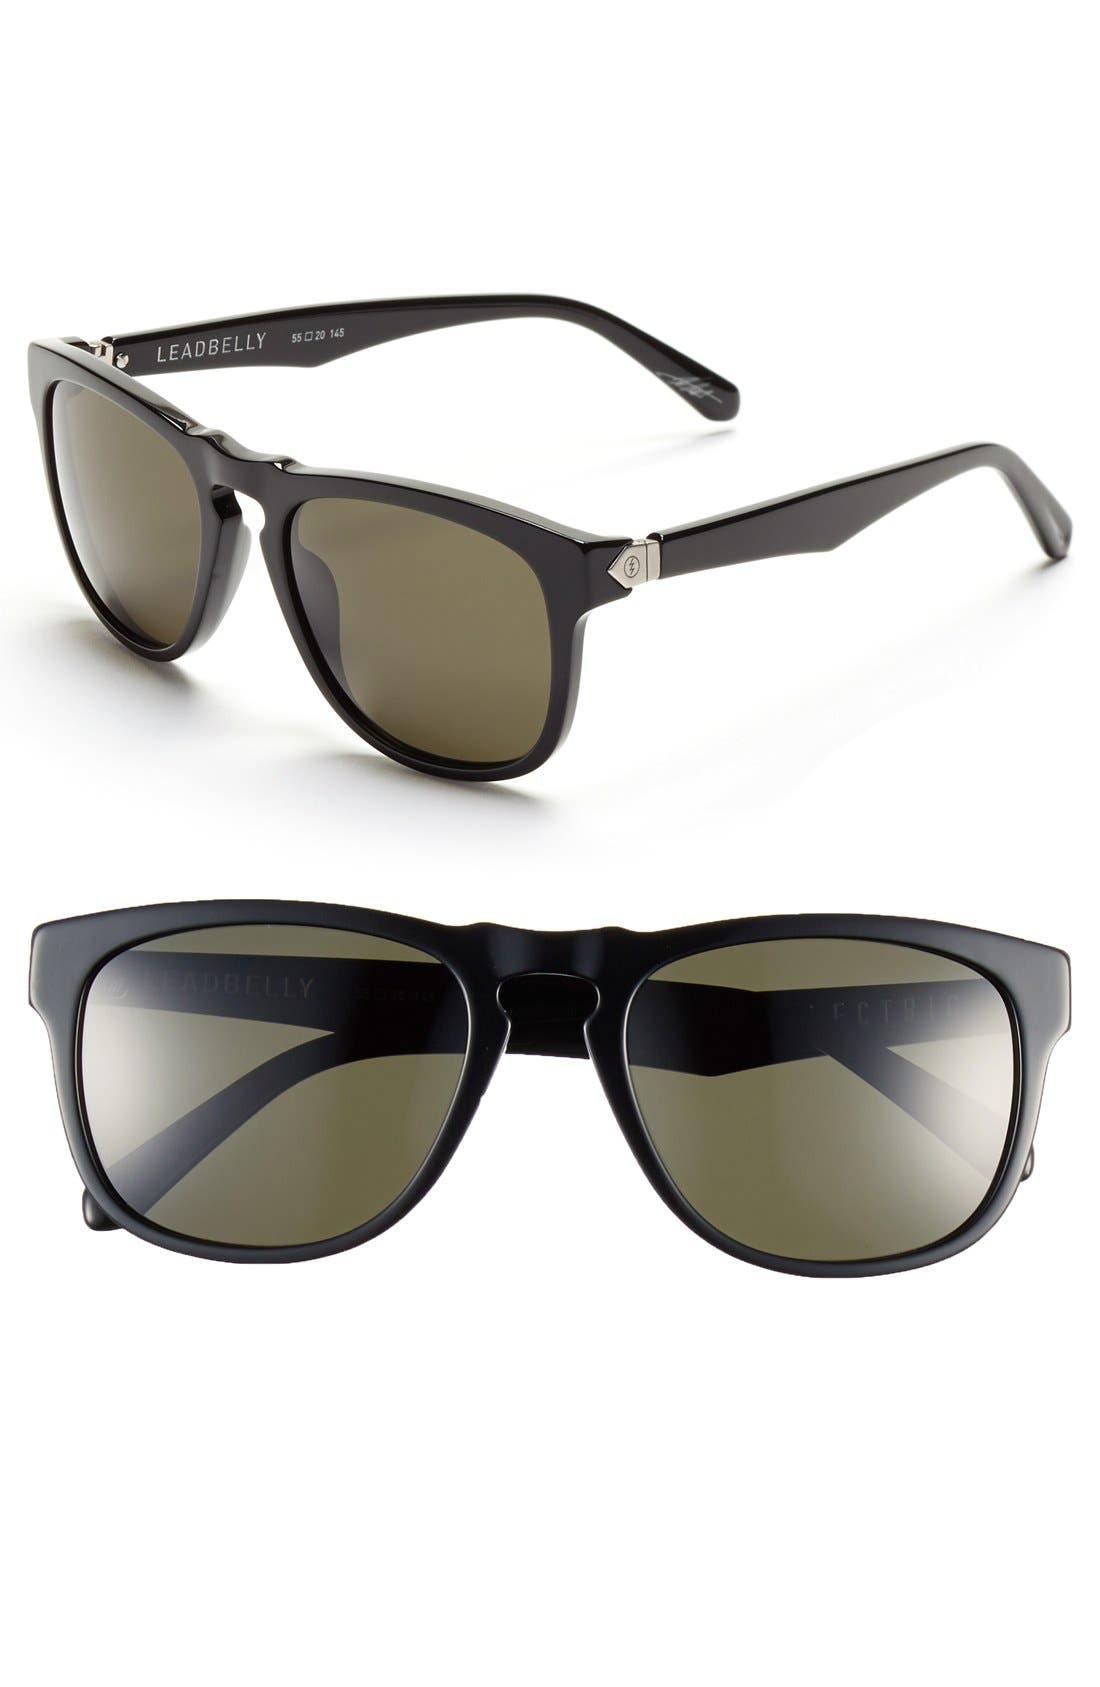 'Leadbelly' 55mm Sunglasses,                         Main,                         color, Gloss Black/ Grey